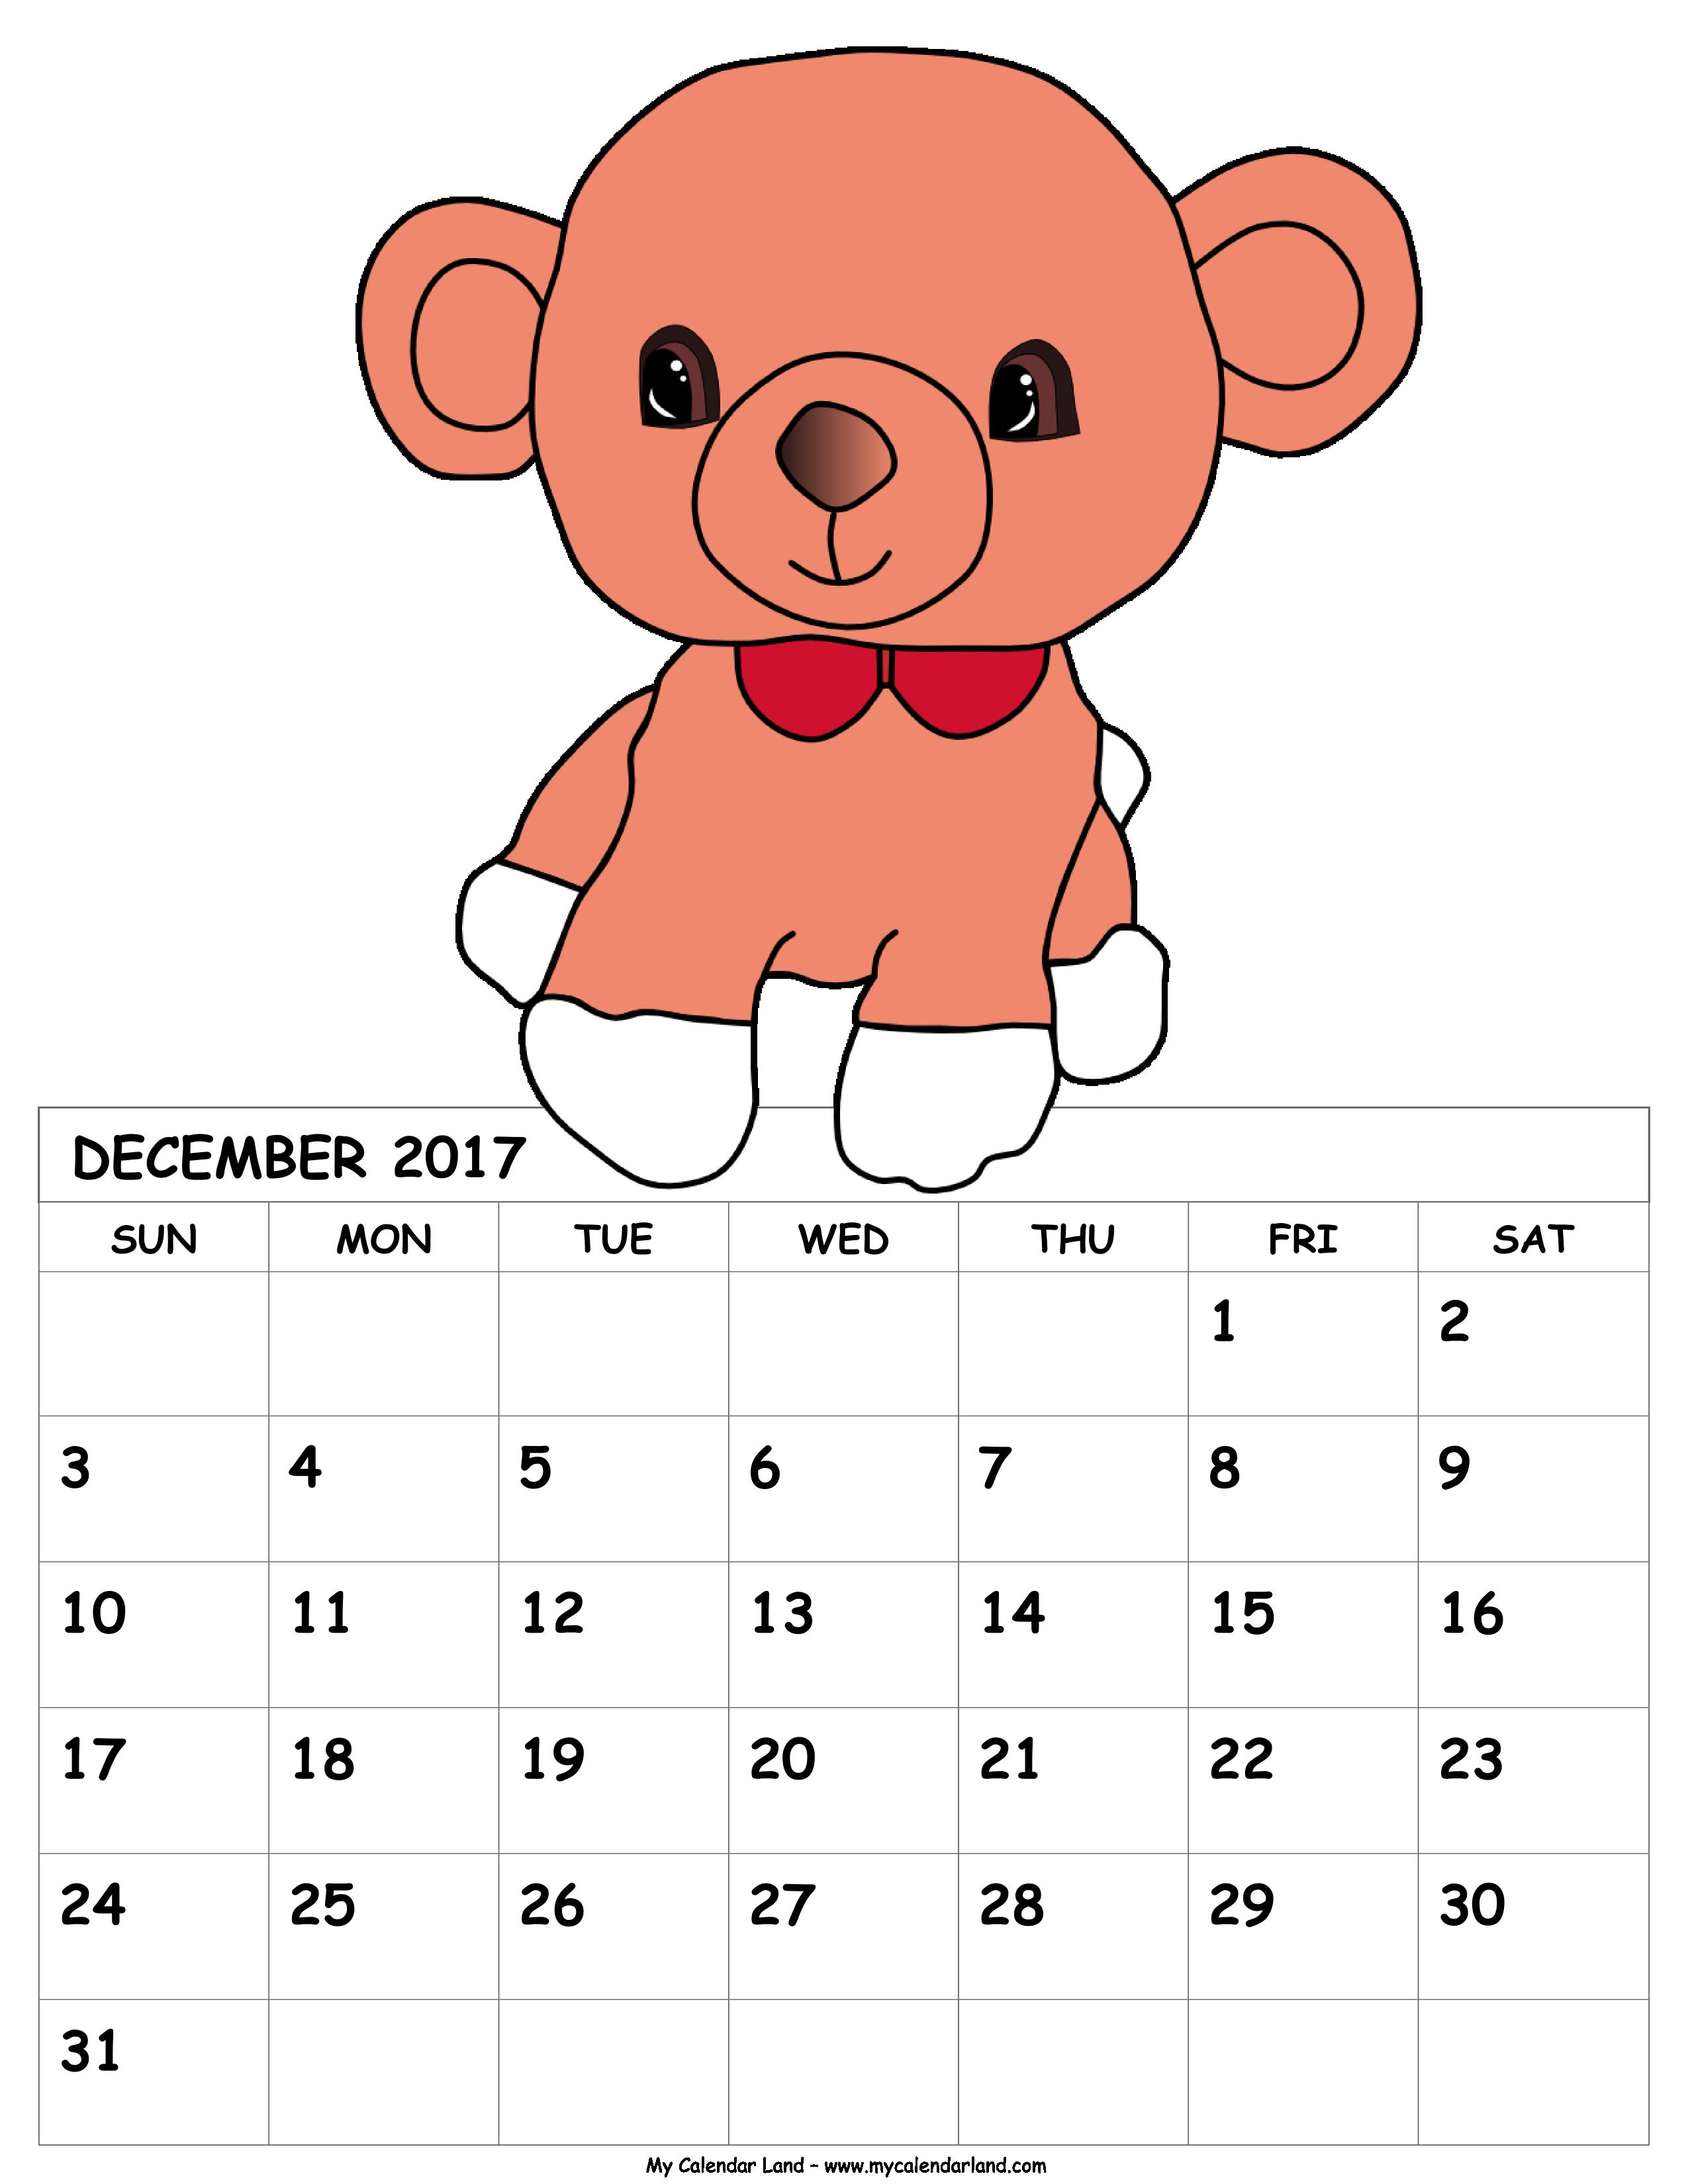 Schedule clipart holiday calendar. December my land we